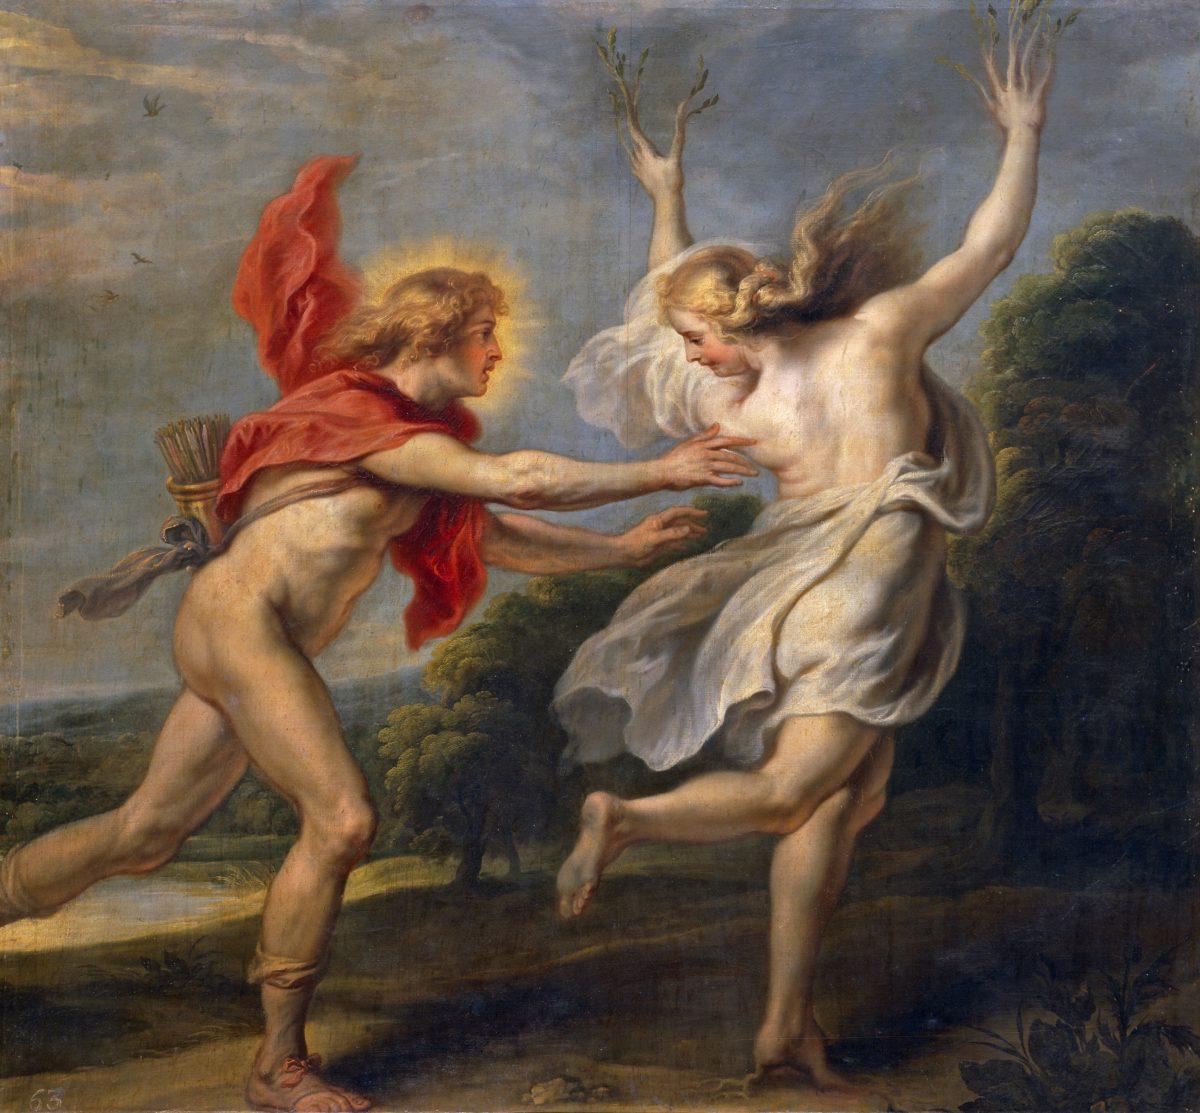 Apollo_chasing_Daphne,_1630 Cornelis de Vos